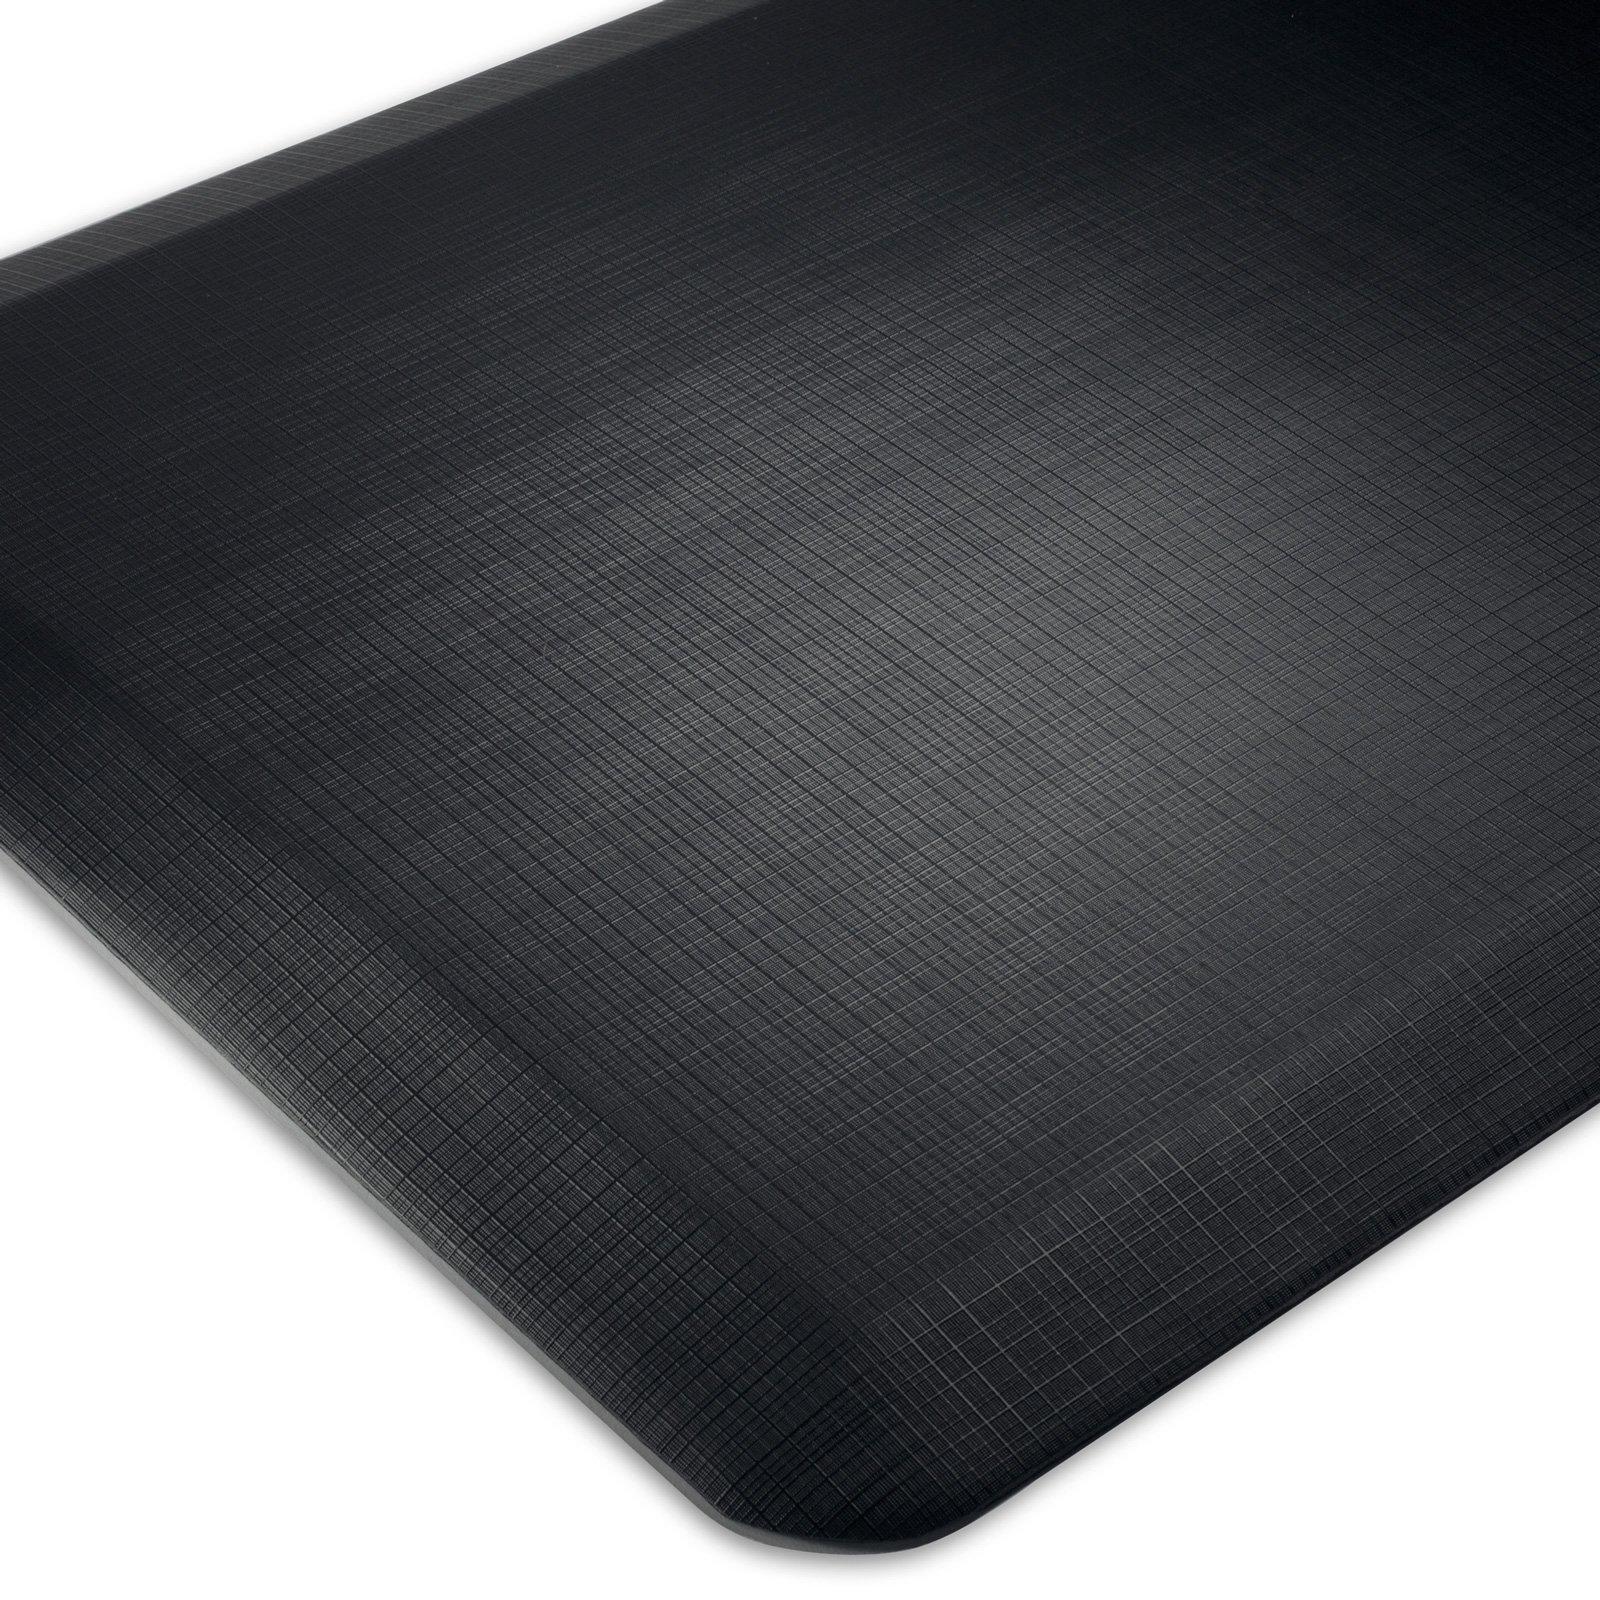 size for of floor anti unbelievable gel kitchen kmart fatigue mats target rubber interlocking walmart costco full rugs